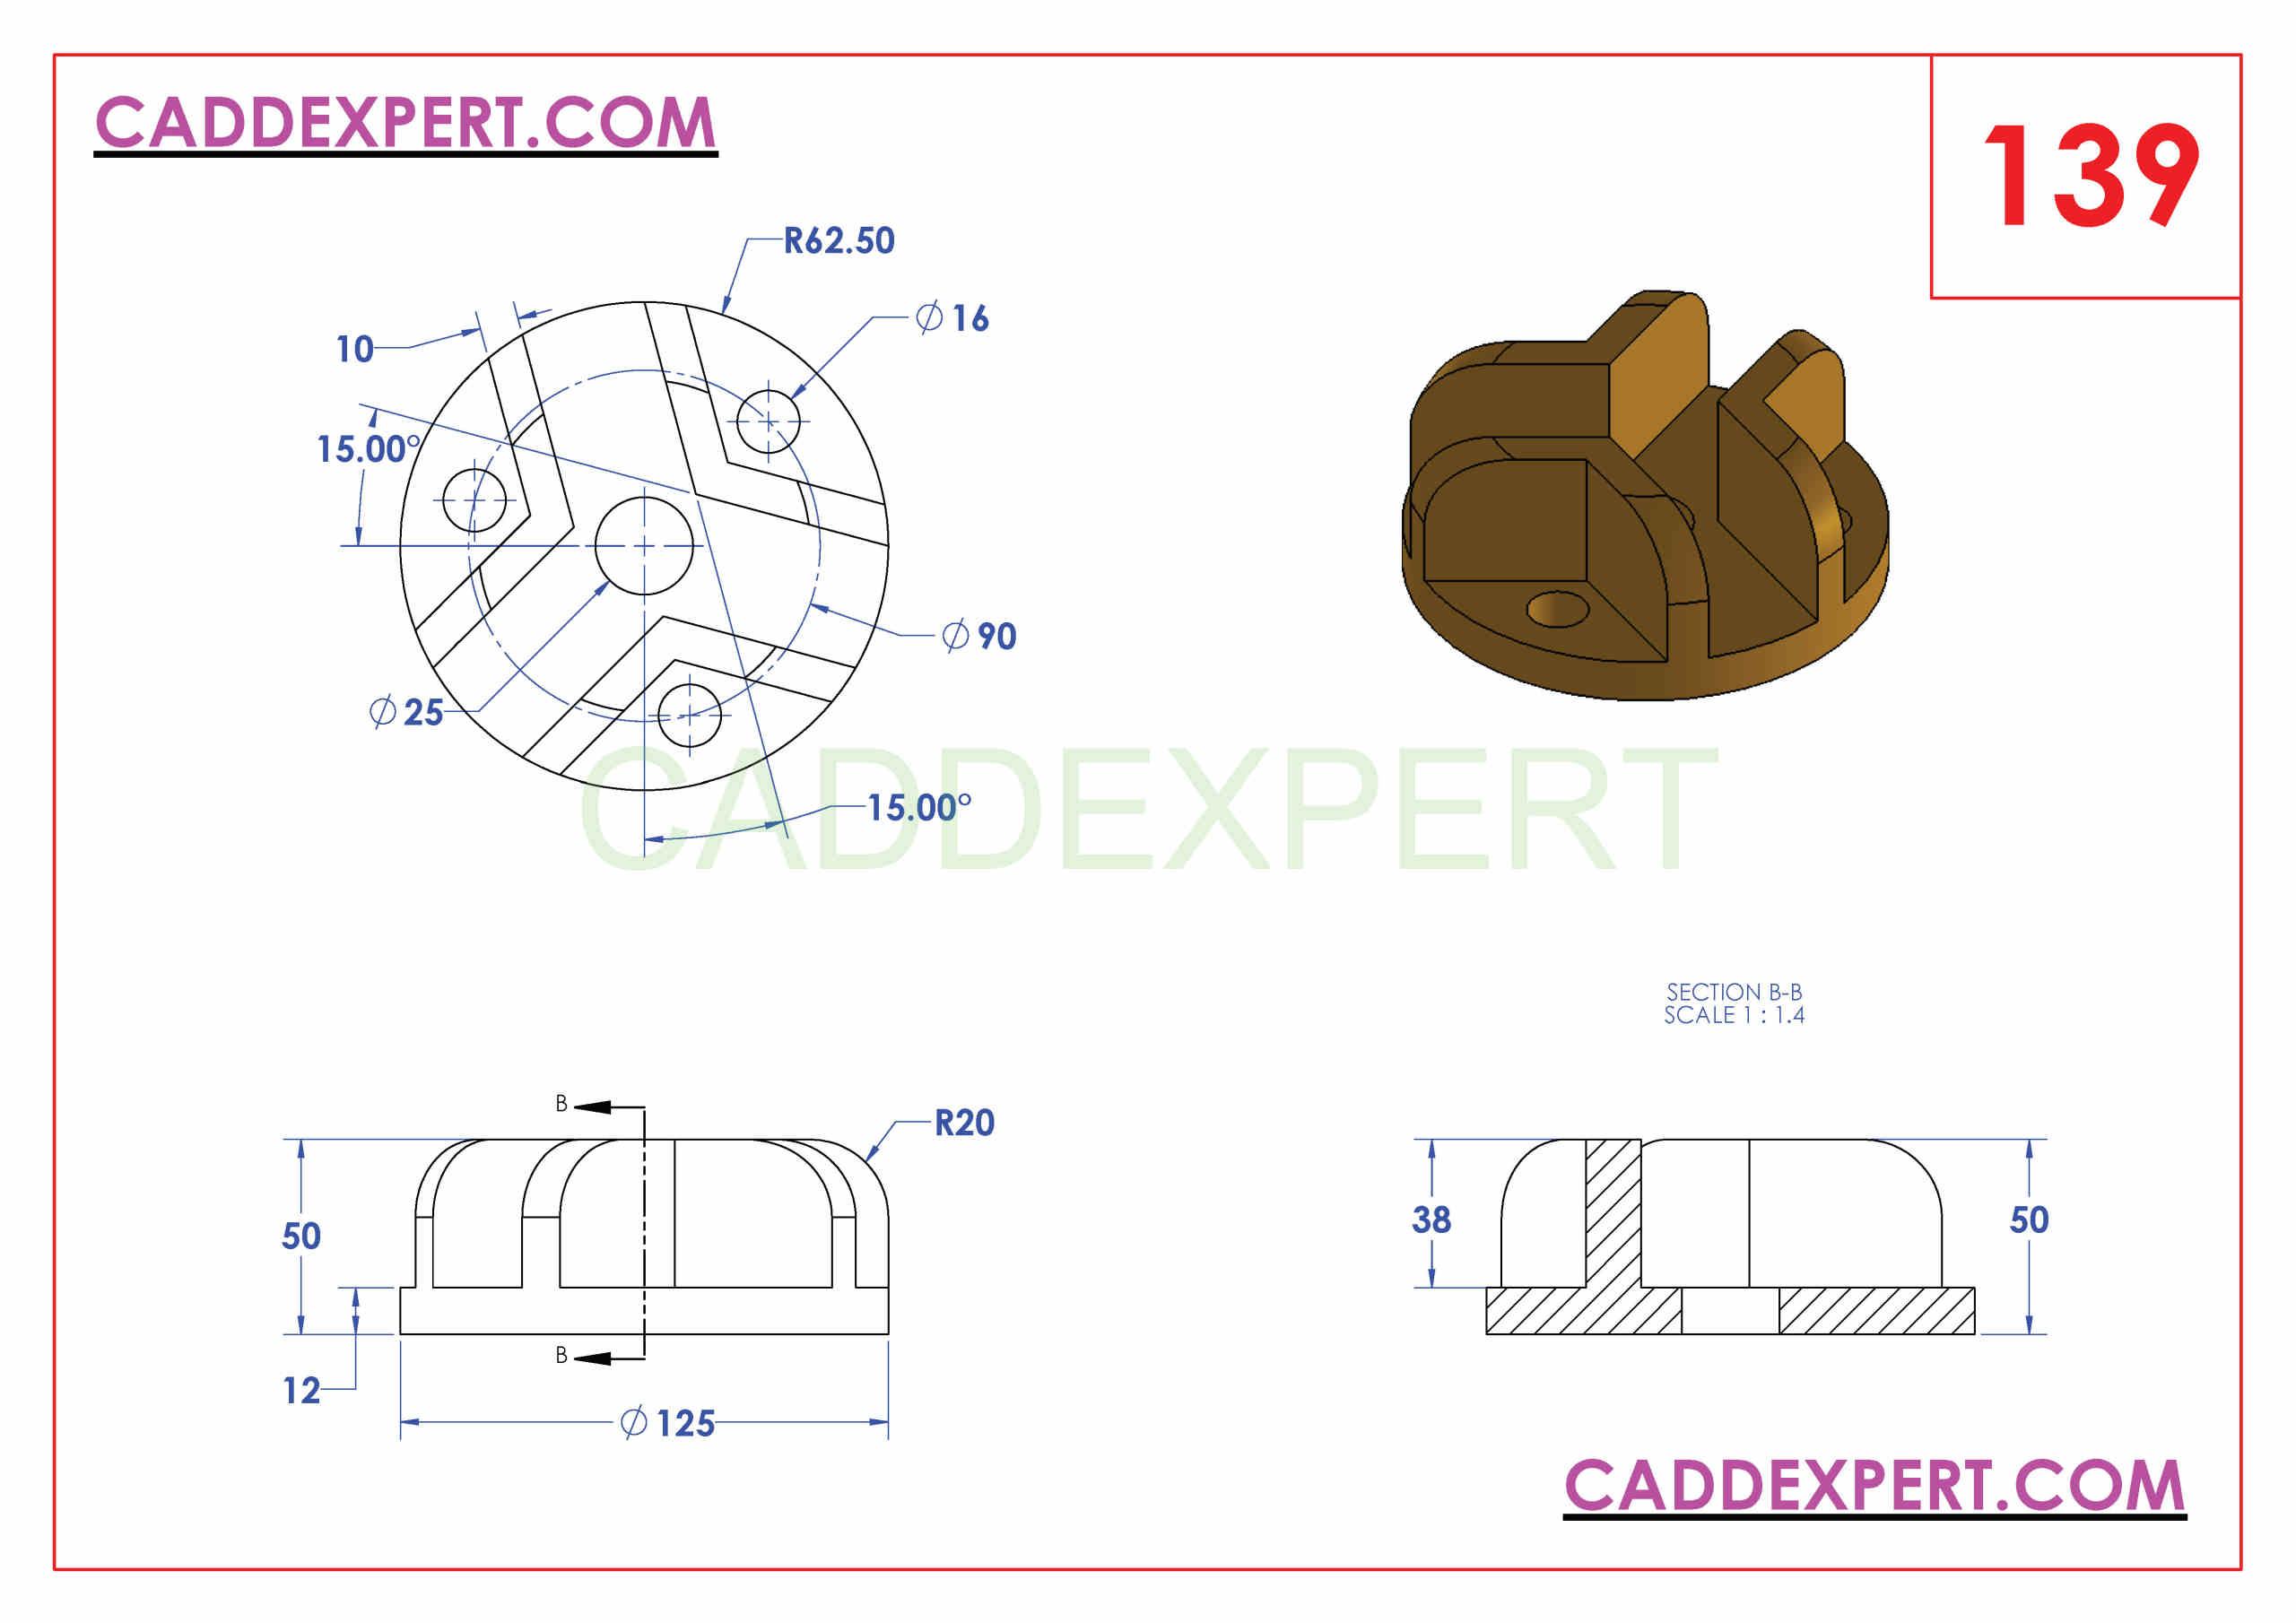 SOLIDWORKS CATIA NX AUTOCAD 3D DRAWINGS PRACTICE BOOKS 100 PDF -139